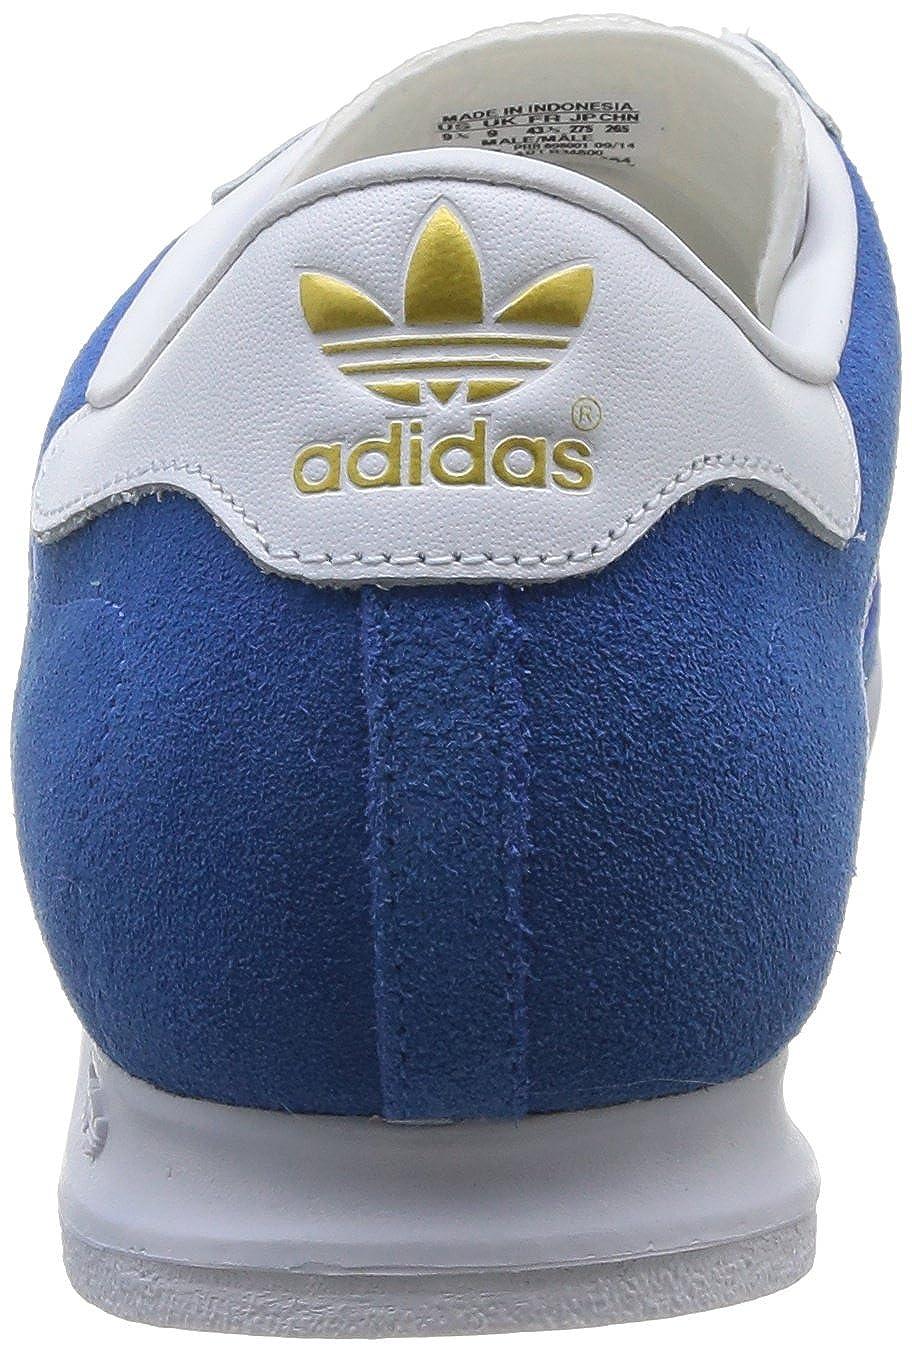 Unisex Erwachsene Adidas Sneakers Originals Beckenbauer 8wNnXPZ0Ok